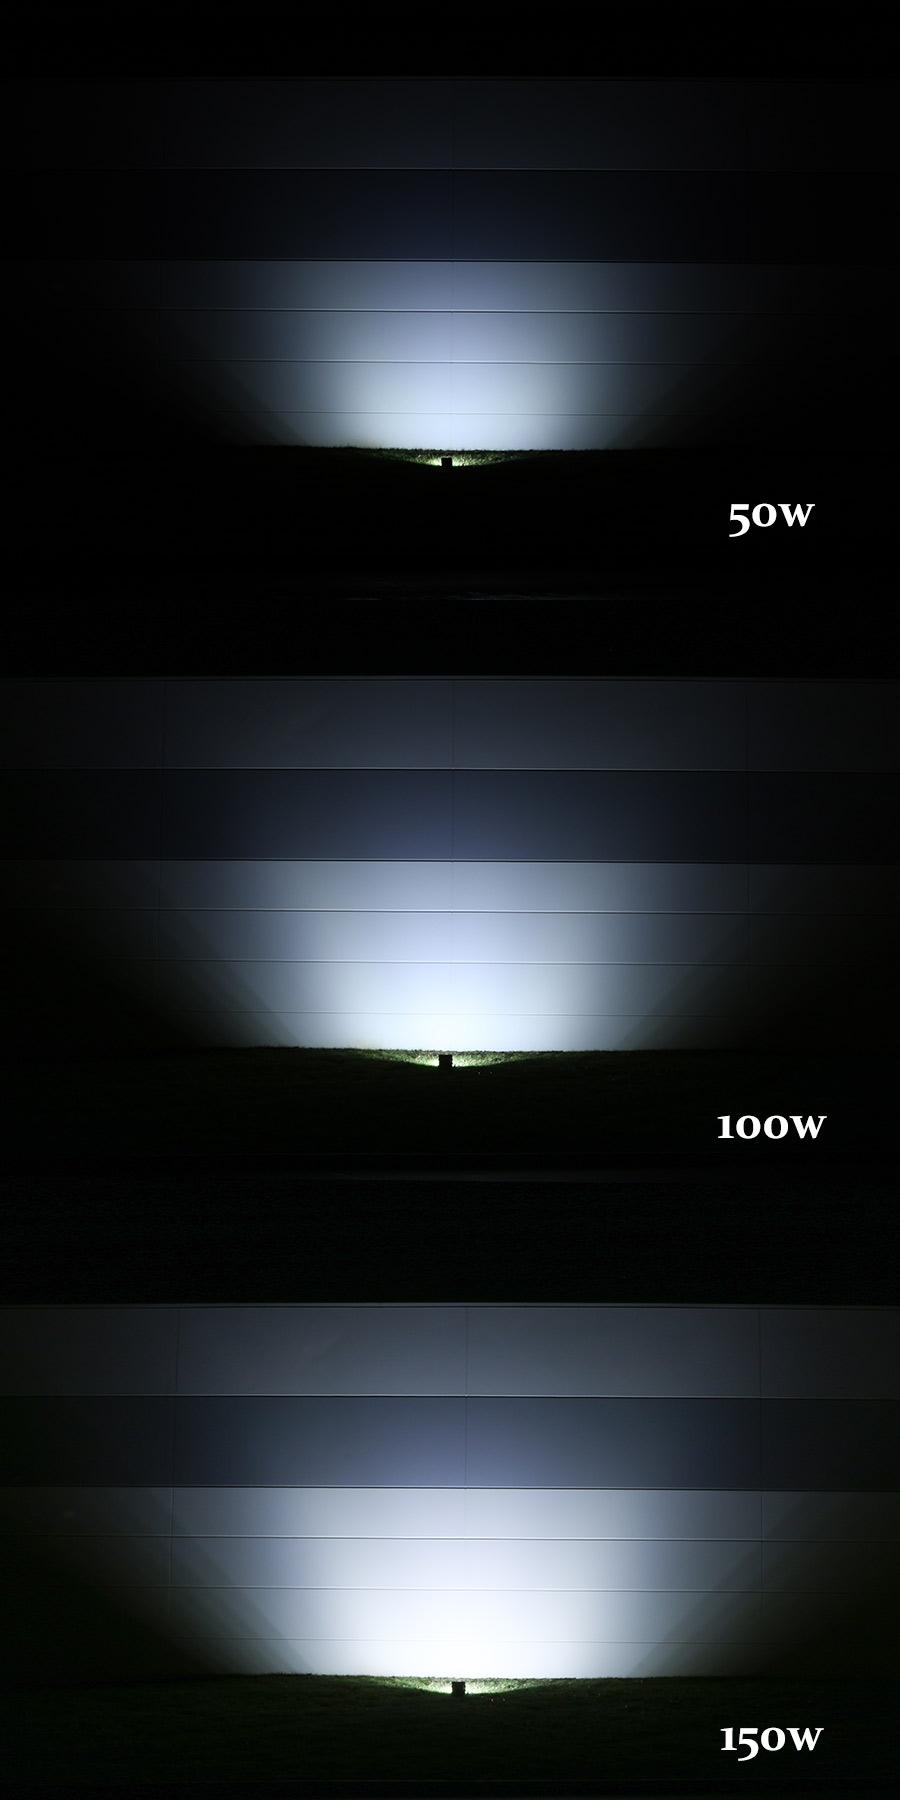 100 watt high power led flood light fixture in natural white led 100 watt high power led flood light fixture in natural white showing beam patterns from approximately 10 arubaitofo Gallery